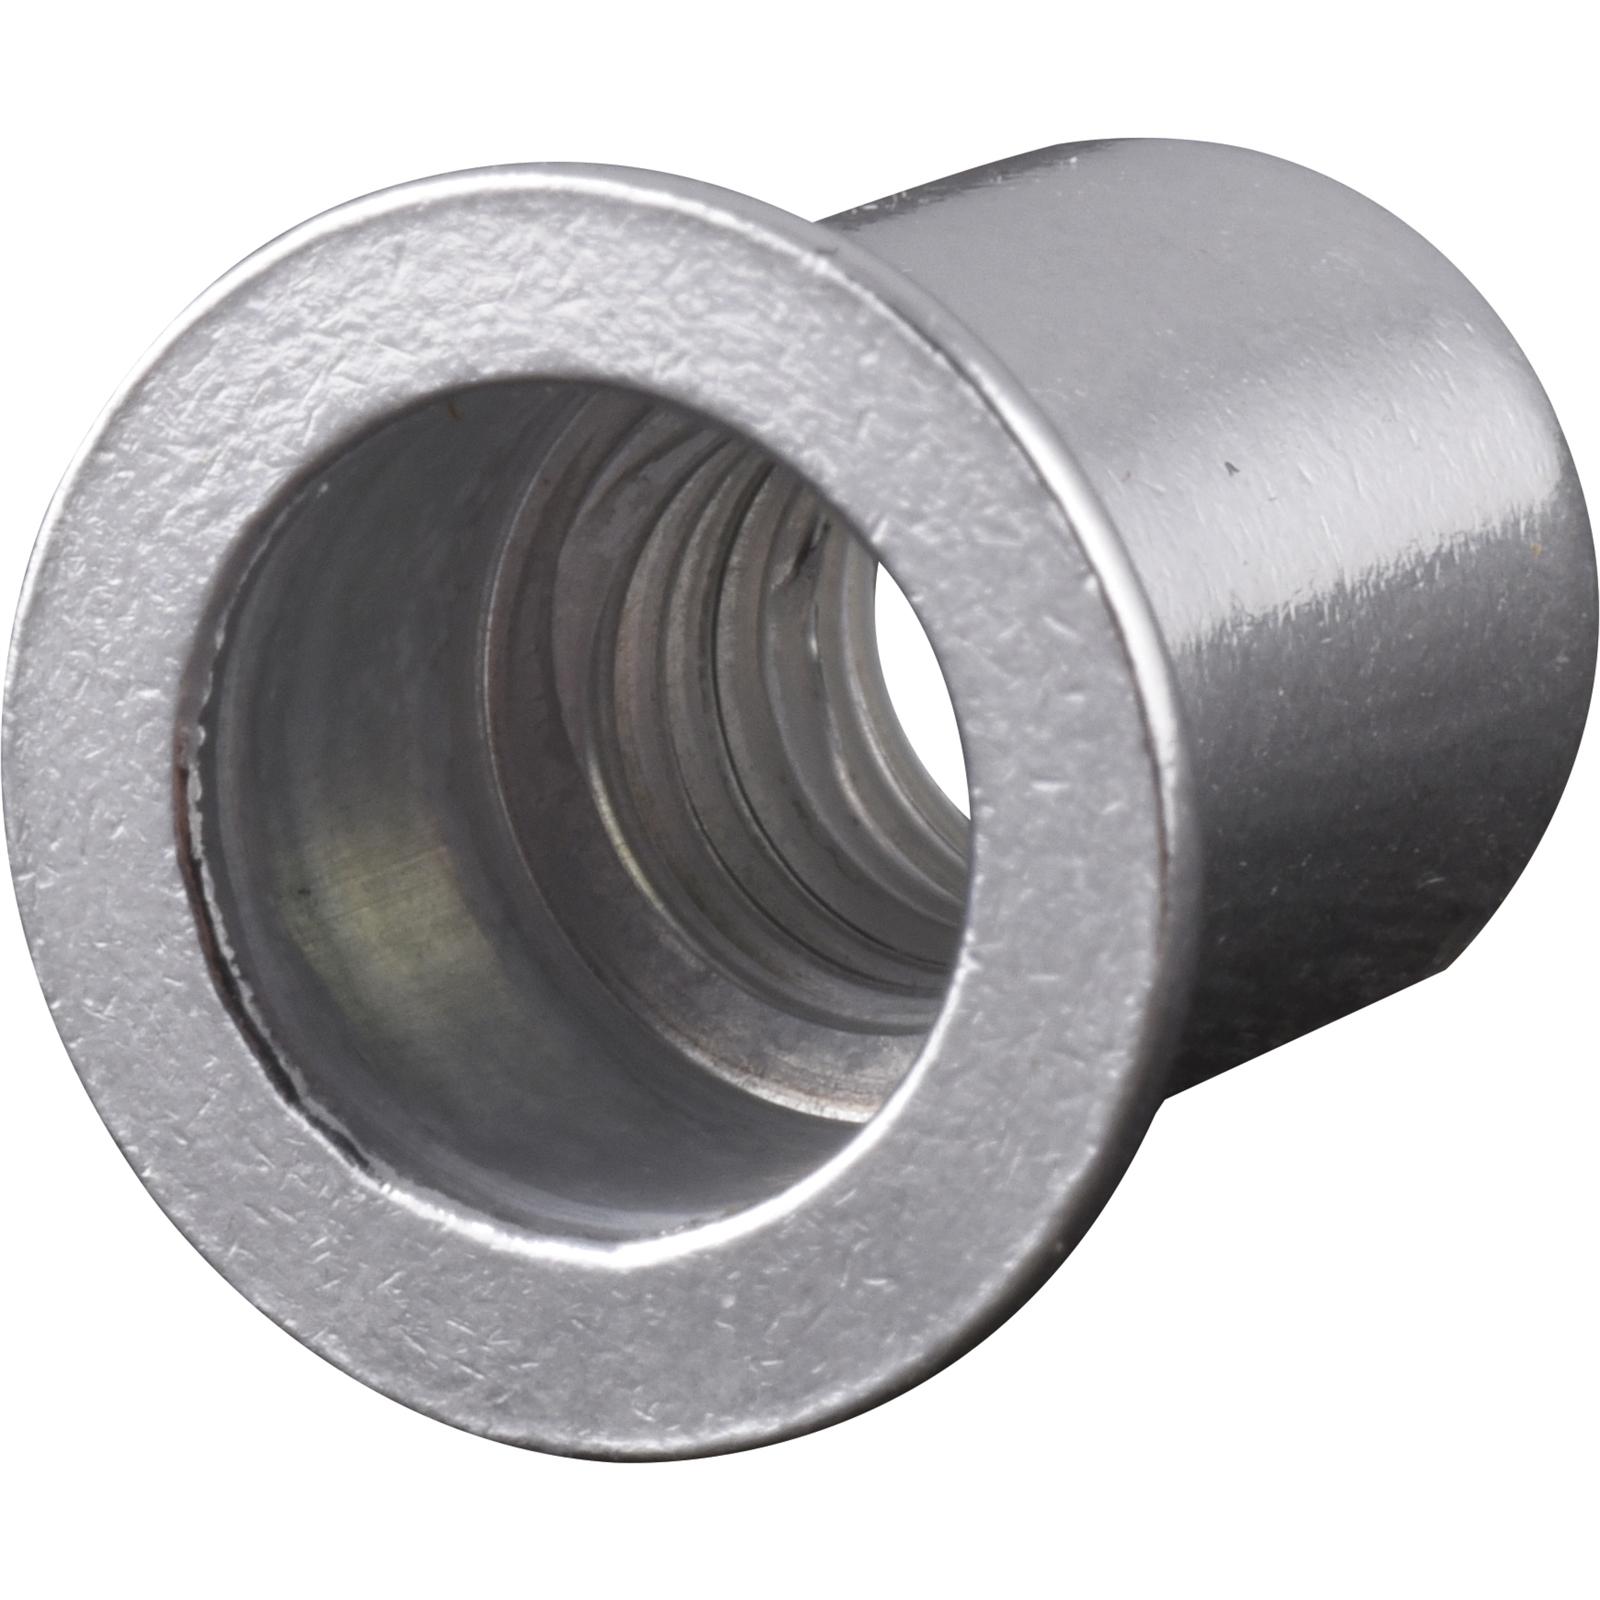 Kincrome M10 10 Piece Rivnut Set